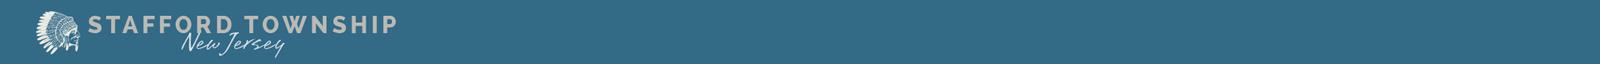 Stafford Township, NJ logo